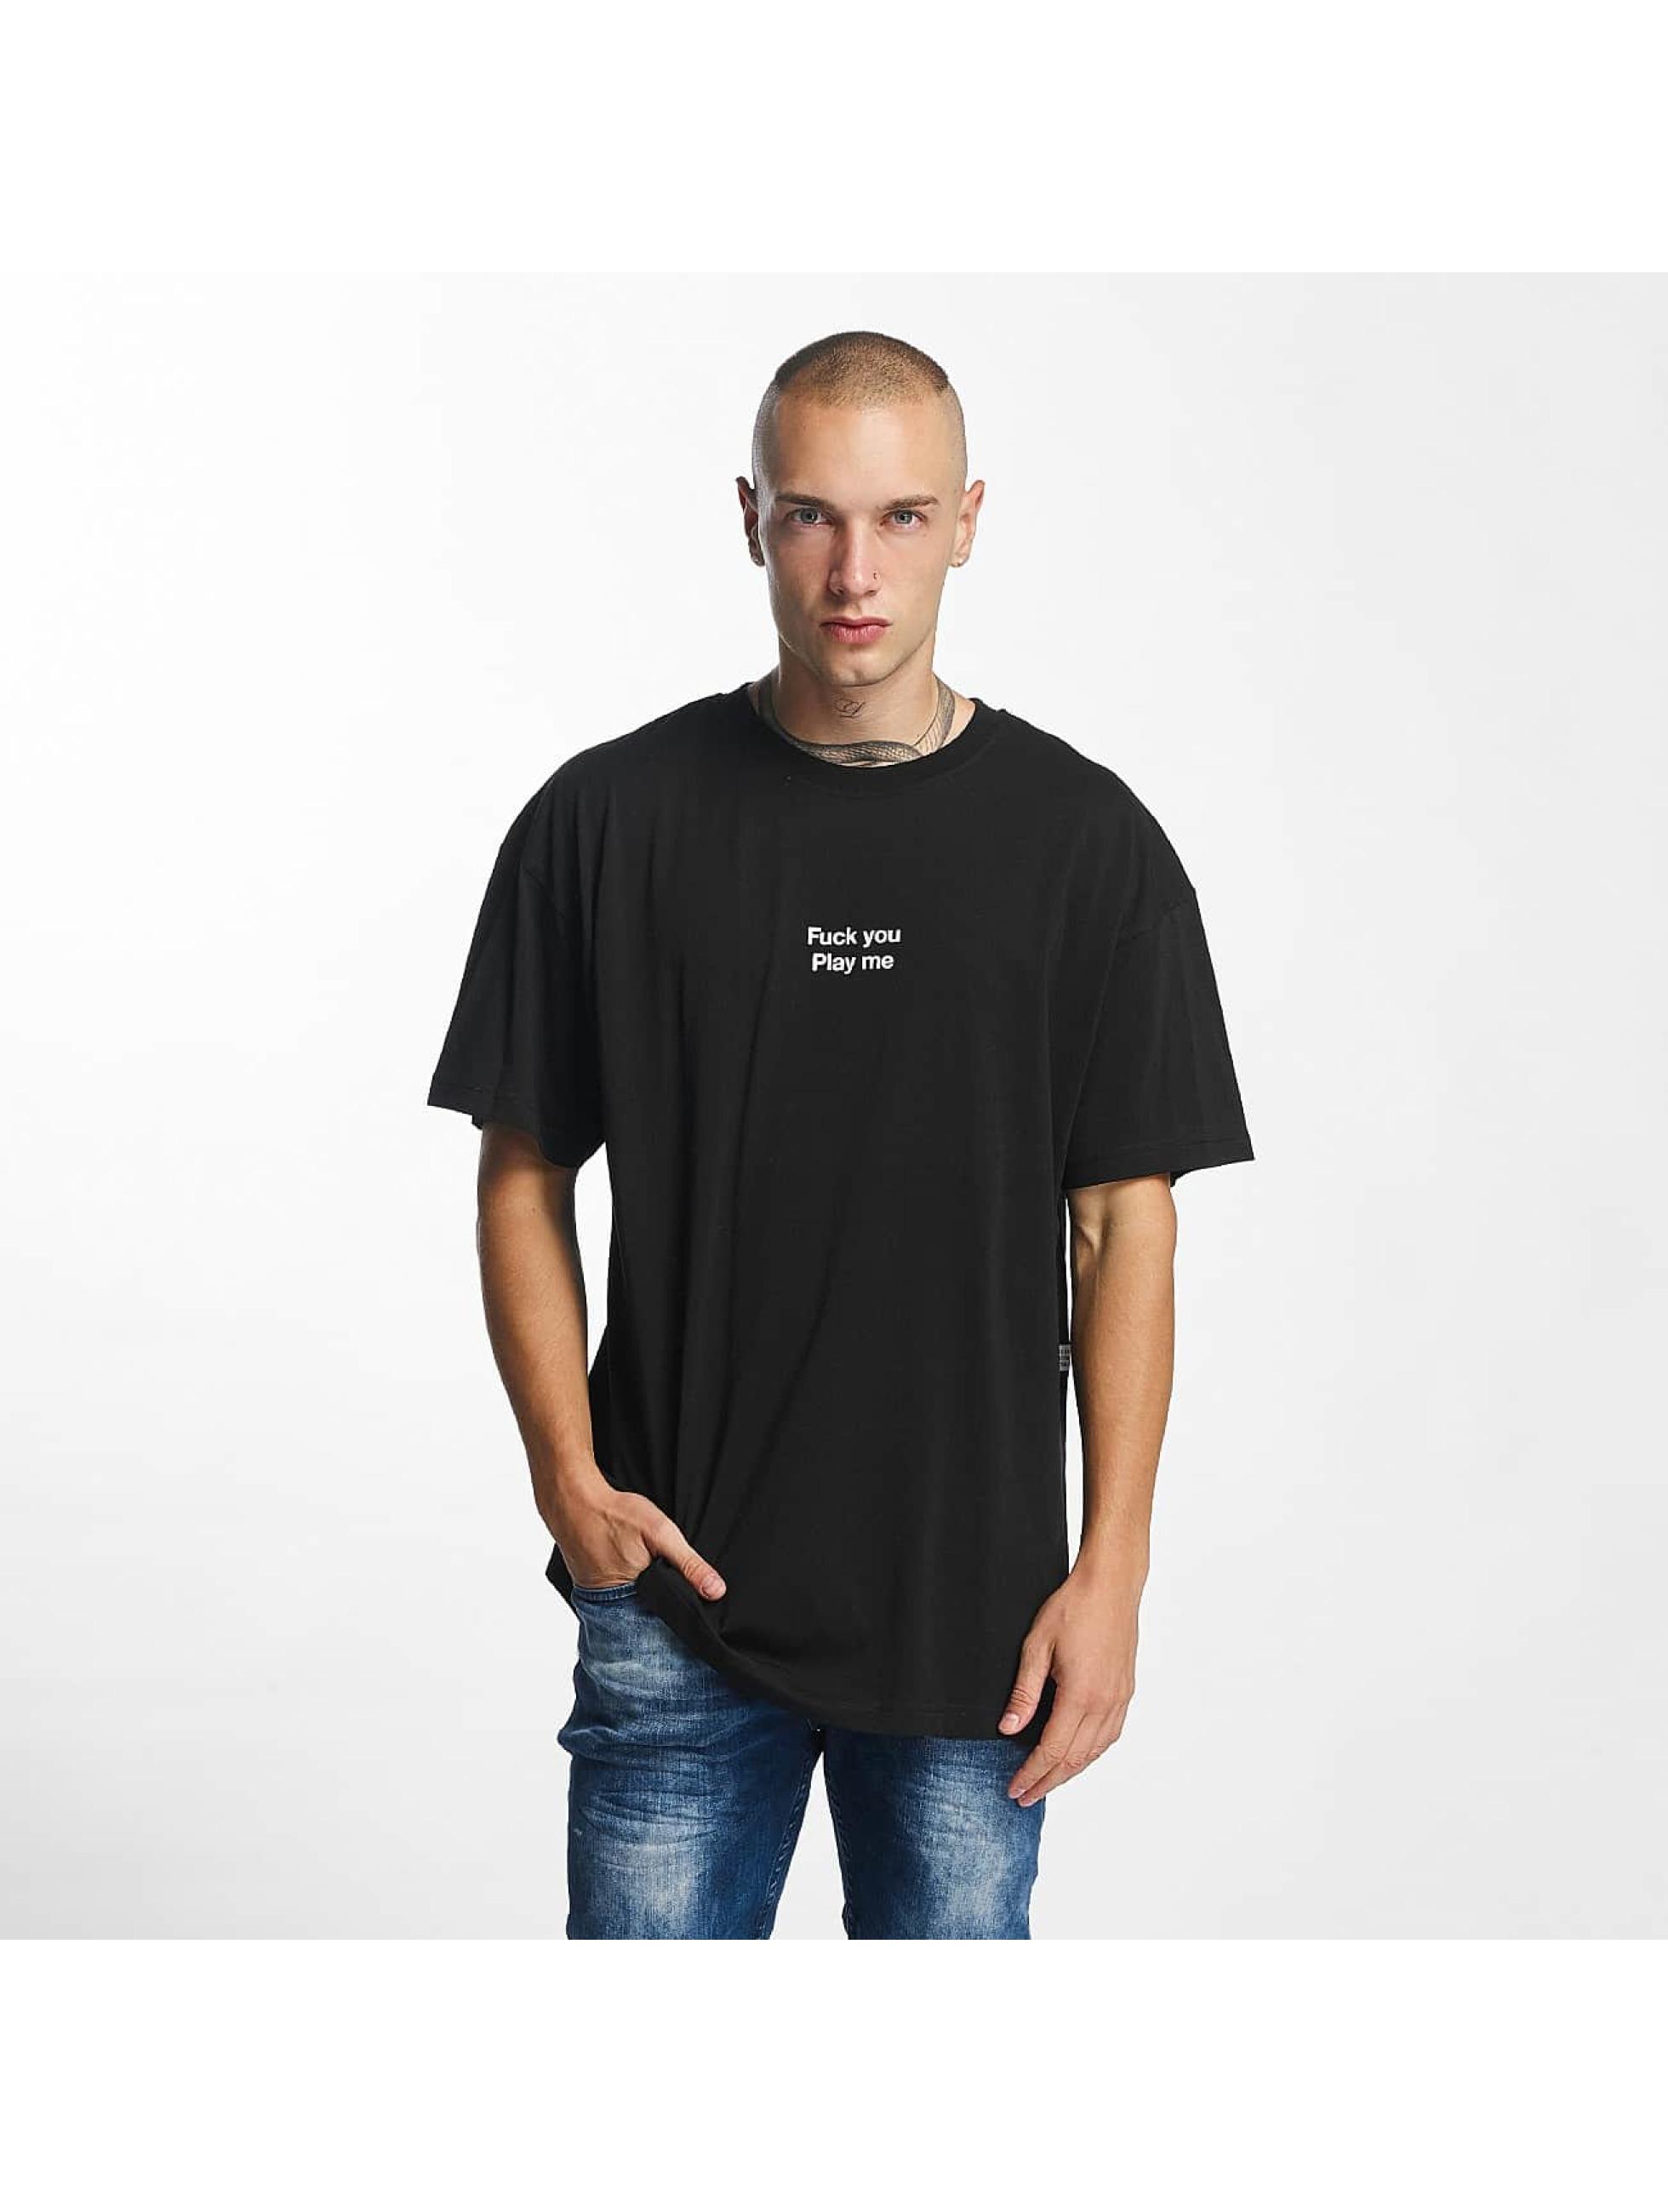 K1X T-Shirt Play Me schwarz